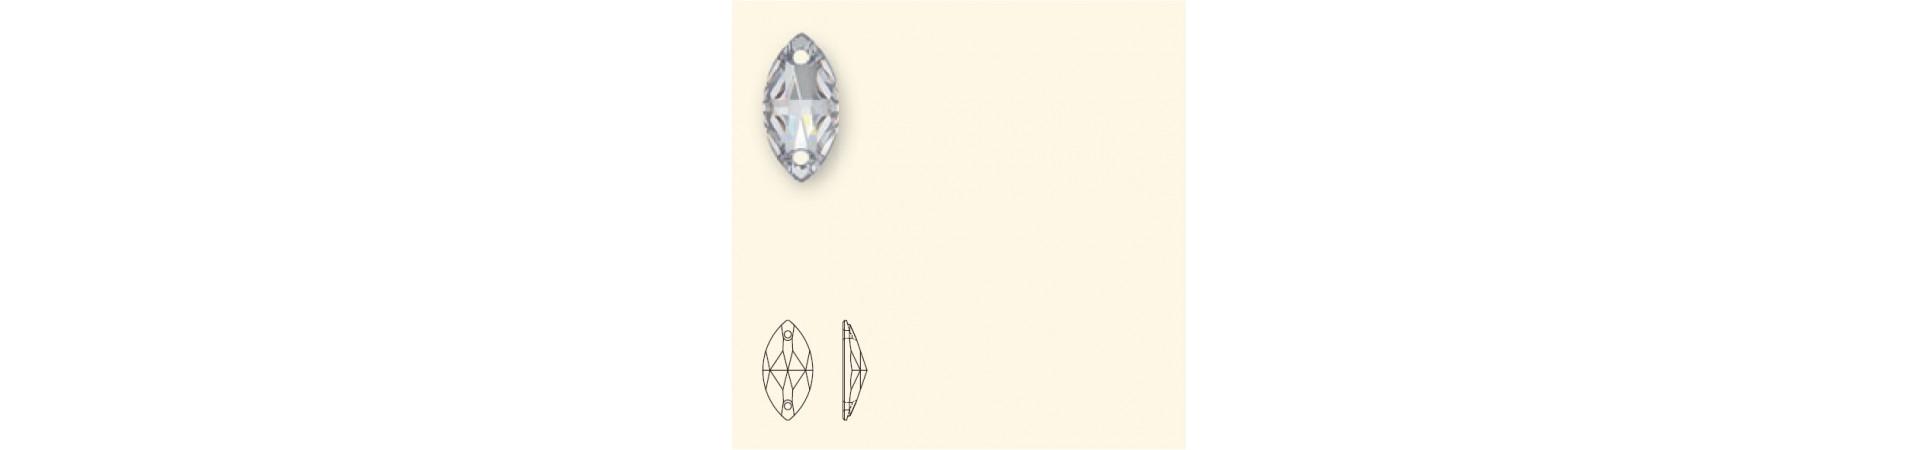 Navette 3223 Ommeltava kiviä